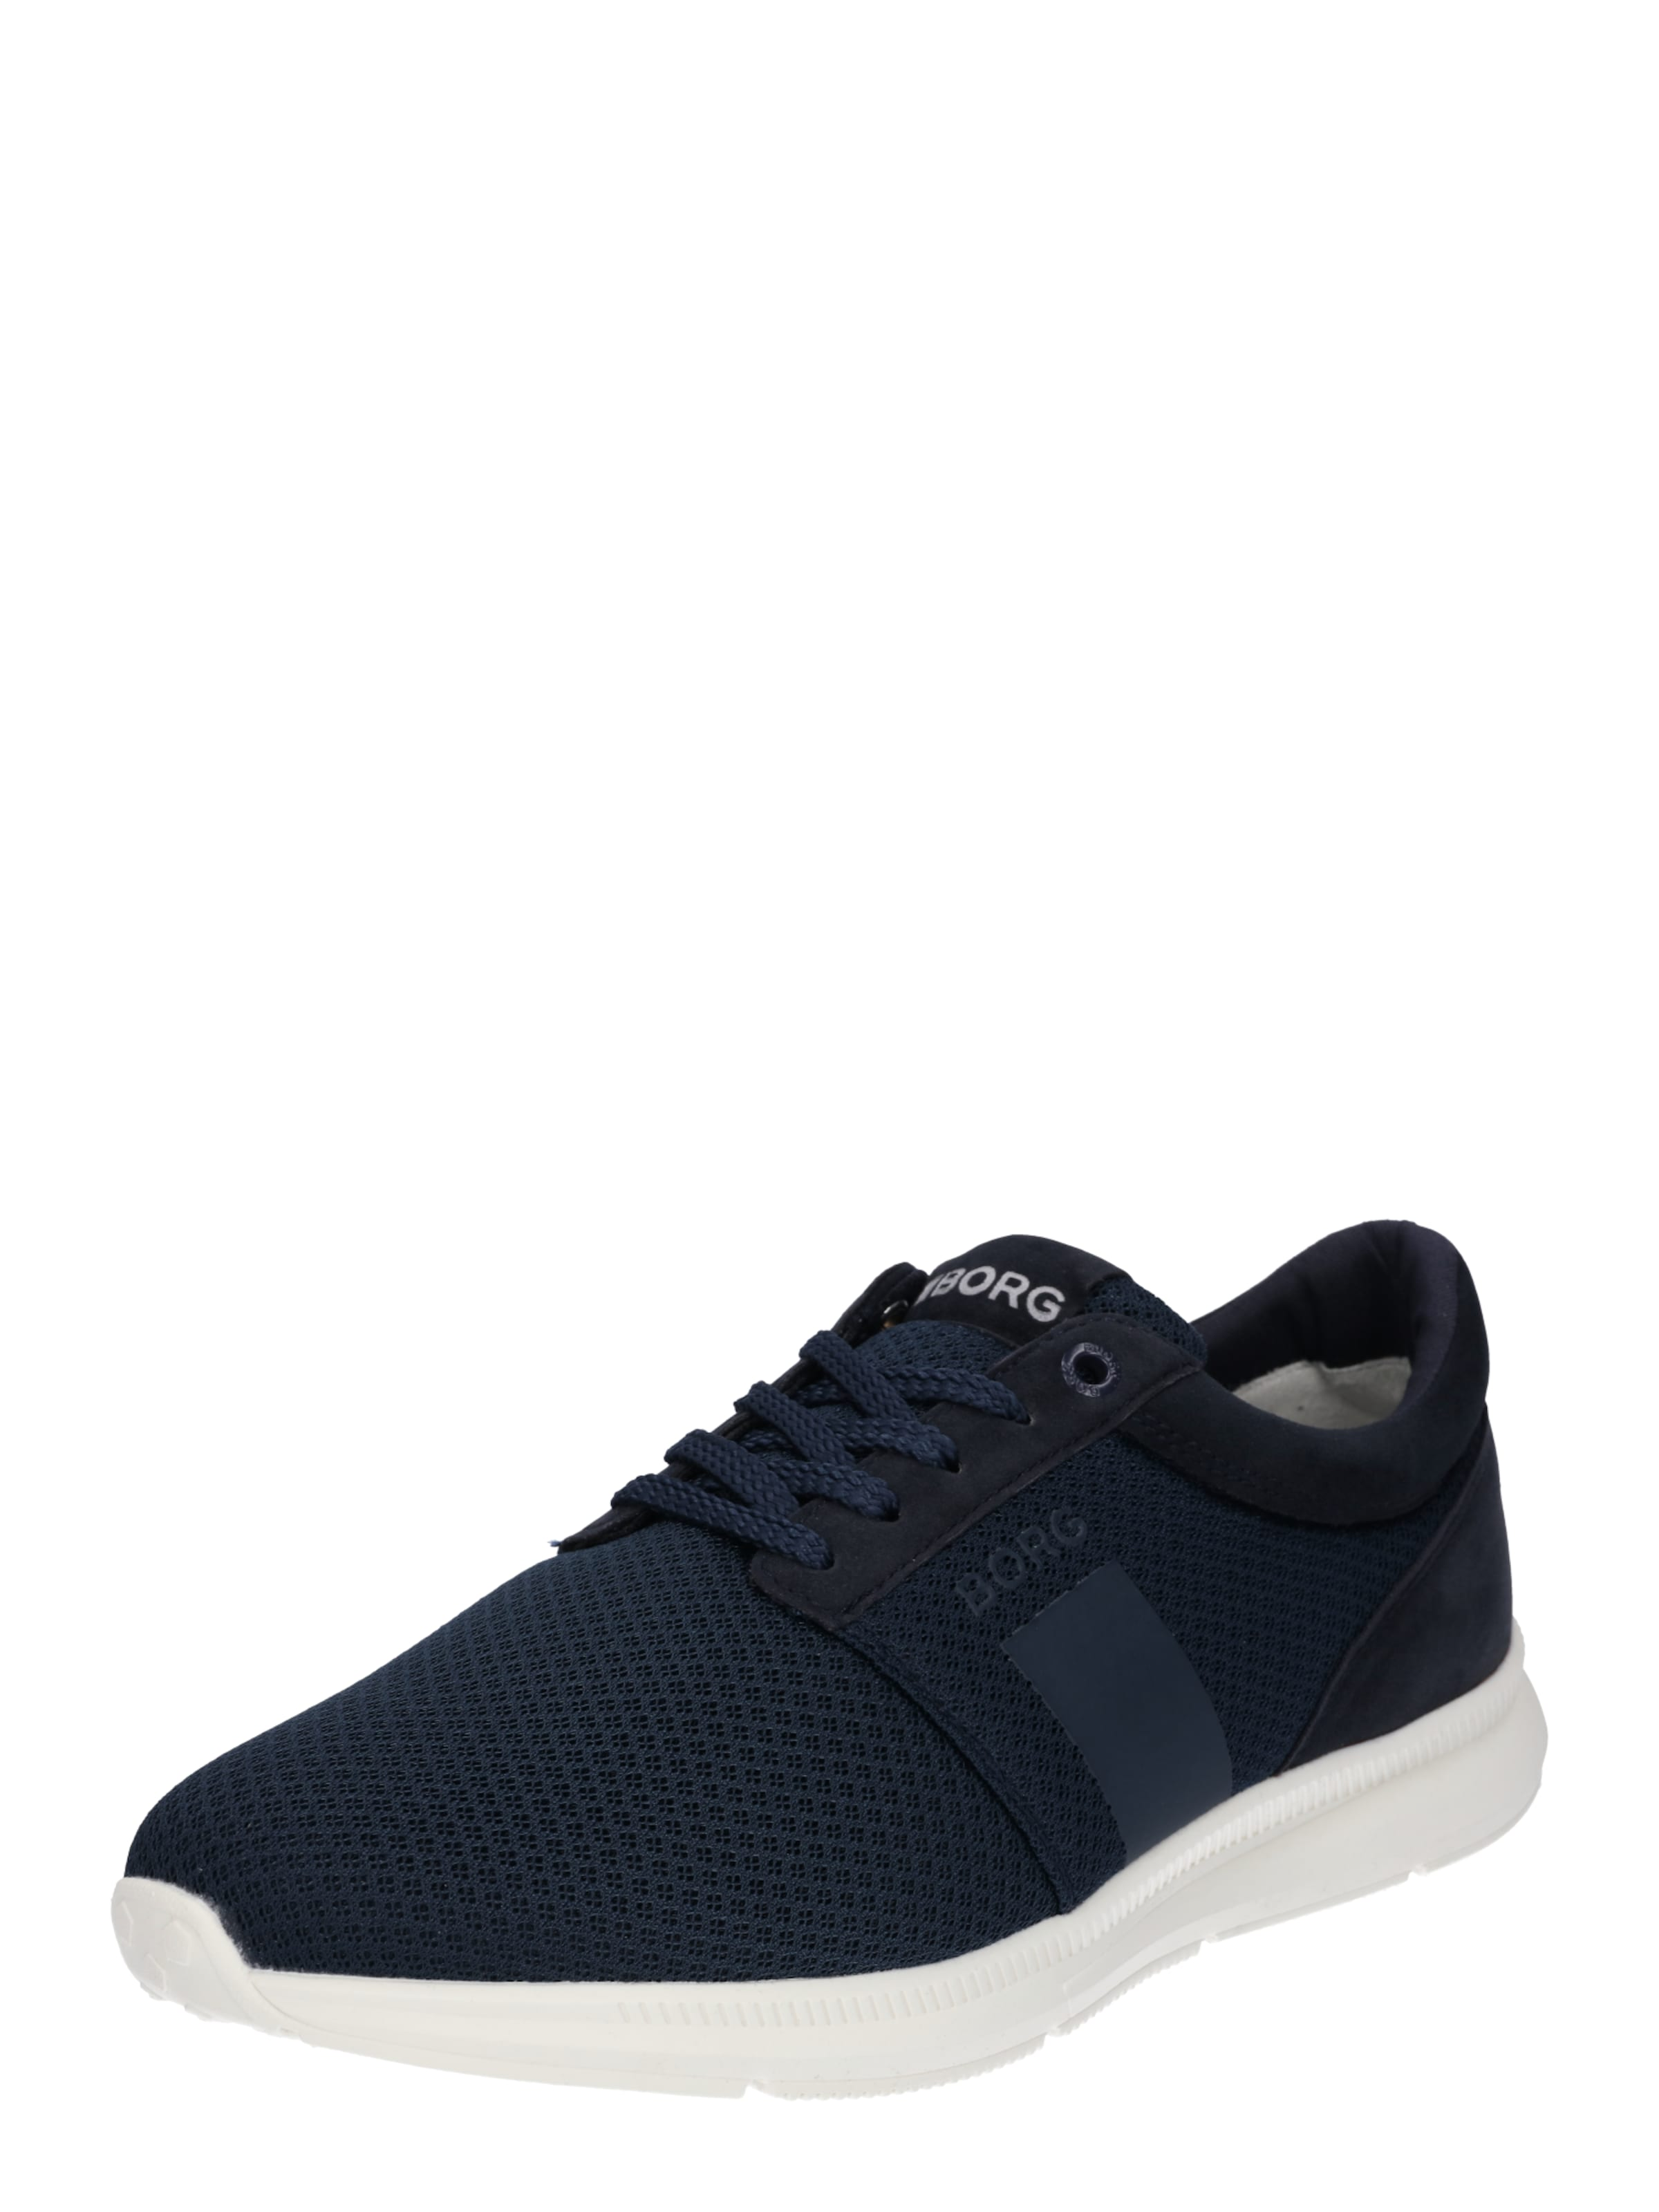 Haltbare Mode billige Gut Schuhe BJÖRN BORG | Sneaker Schuhe Gut billige getragene Schuhe 9249f3